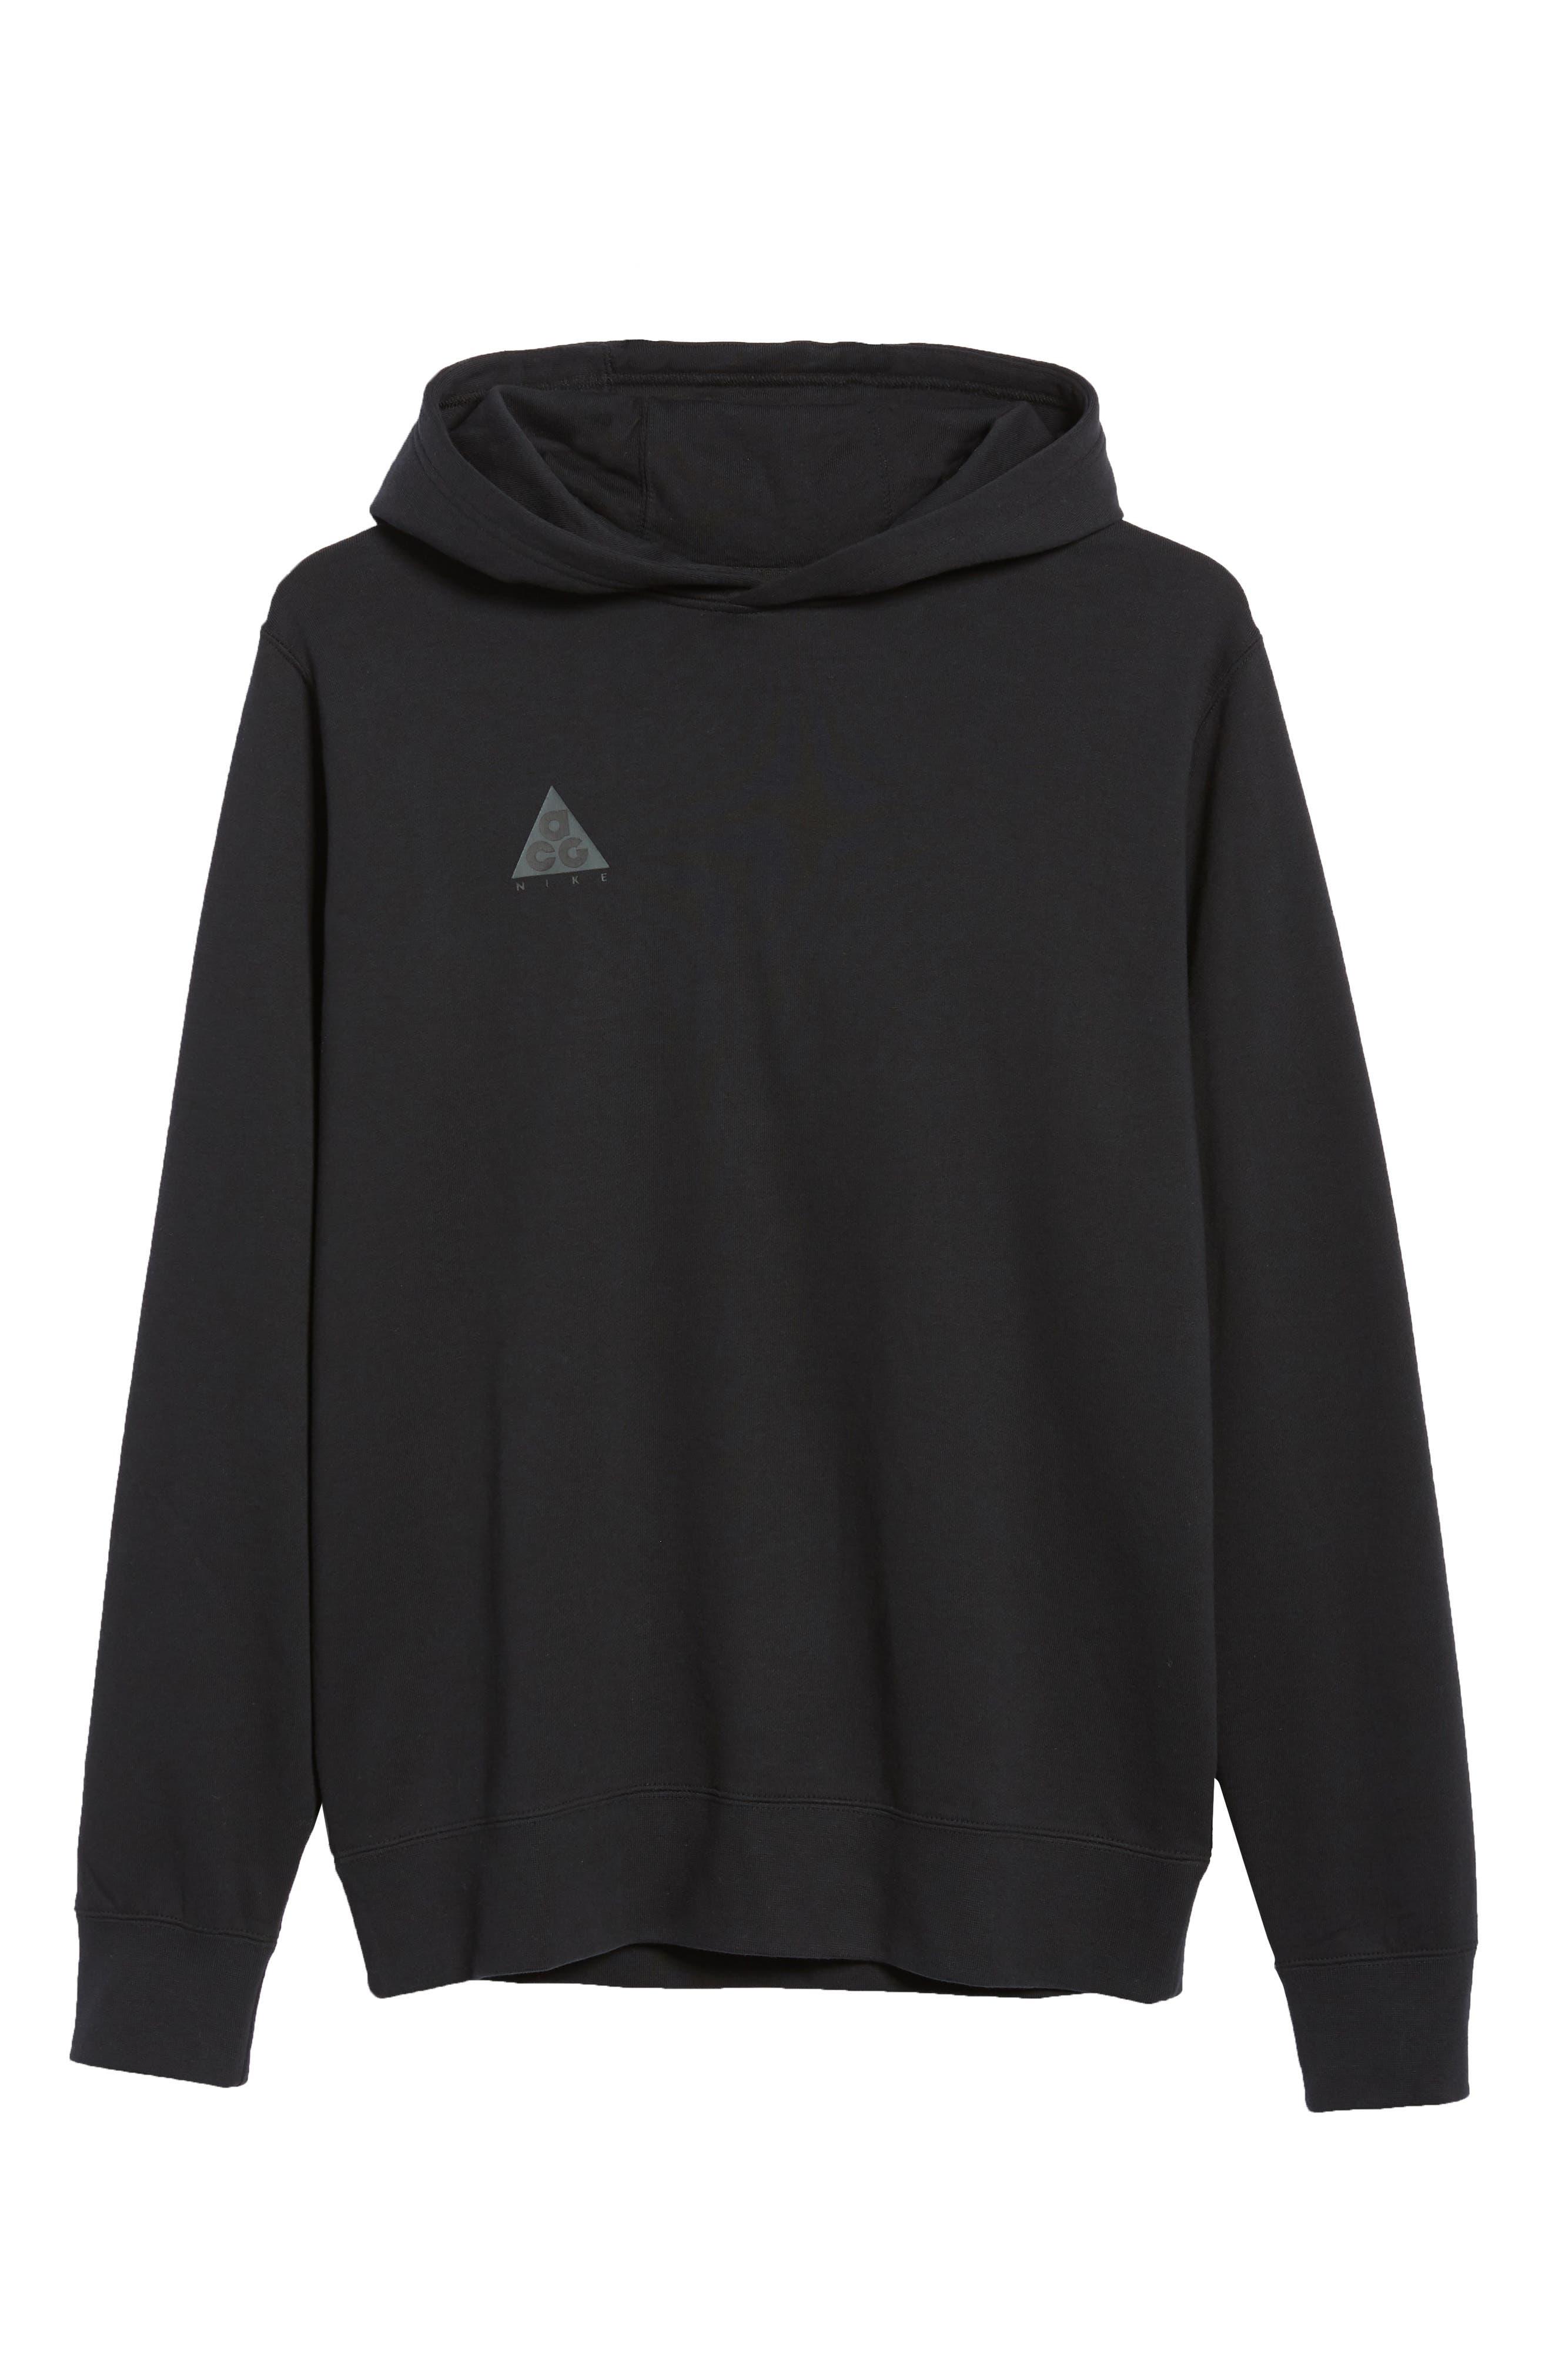 Sportswear ACG Pullover Hoodie,                             Alternate thumbnail 6, color,                             BLACK/ BLACK